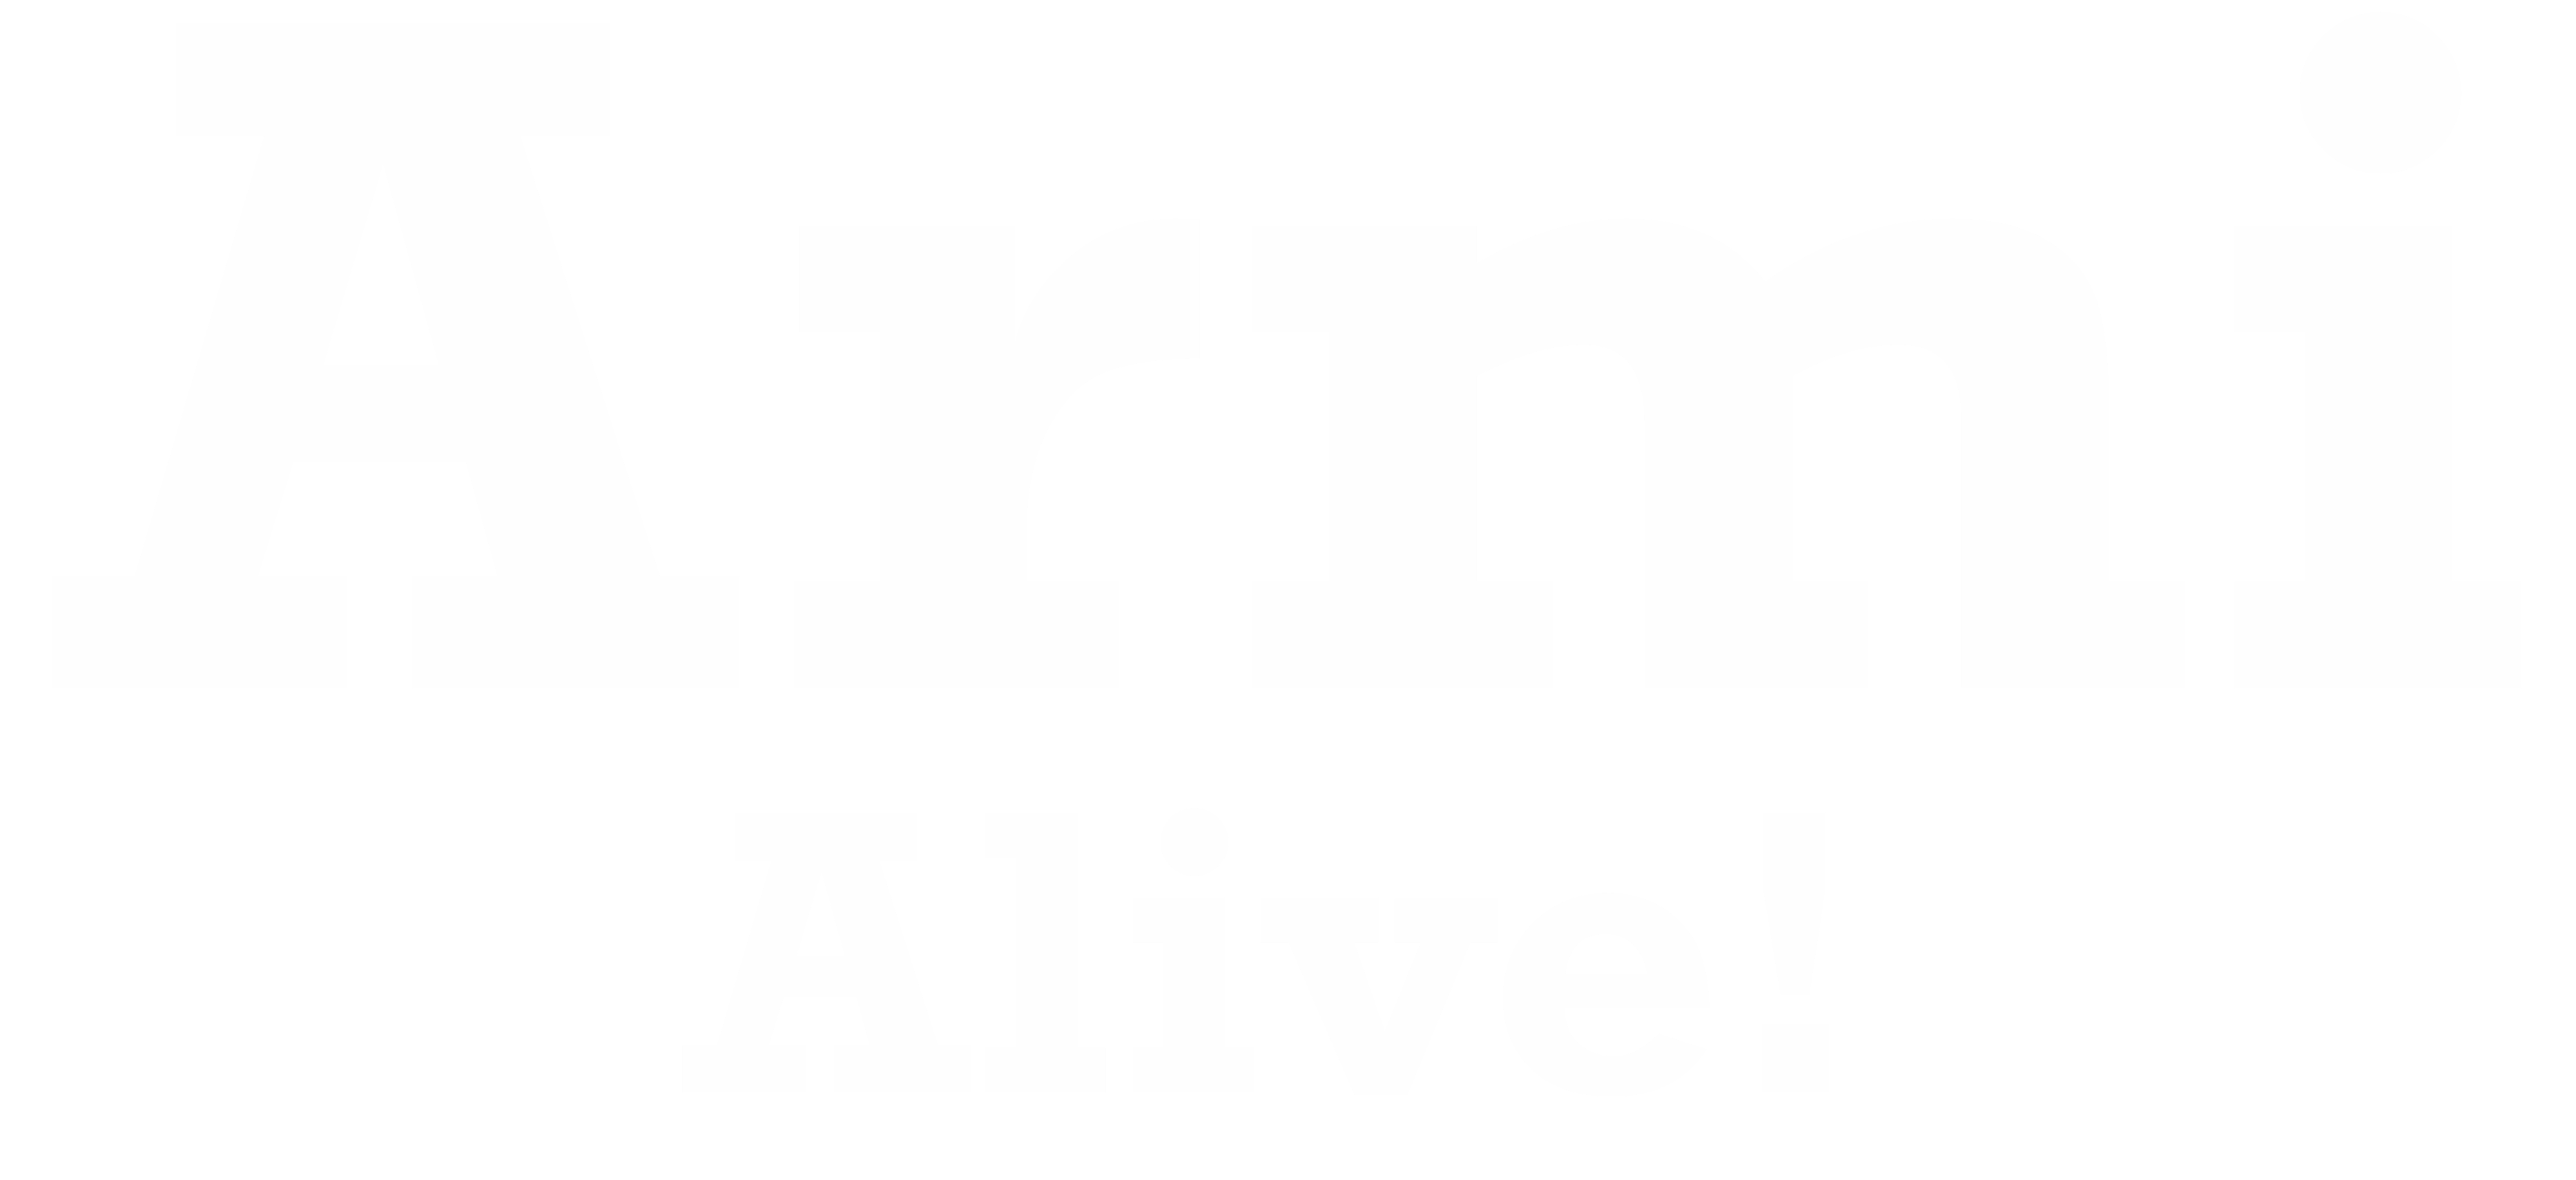 Armi Alive!